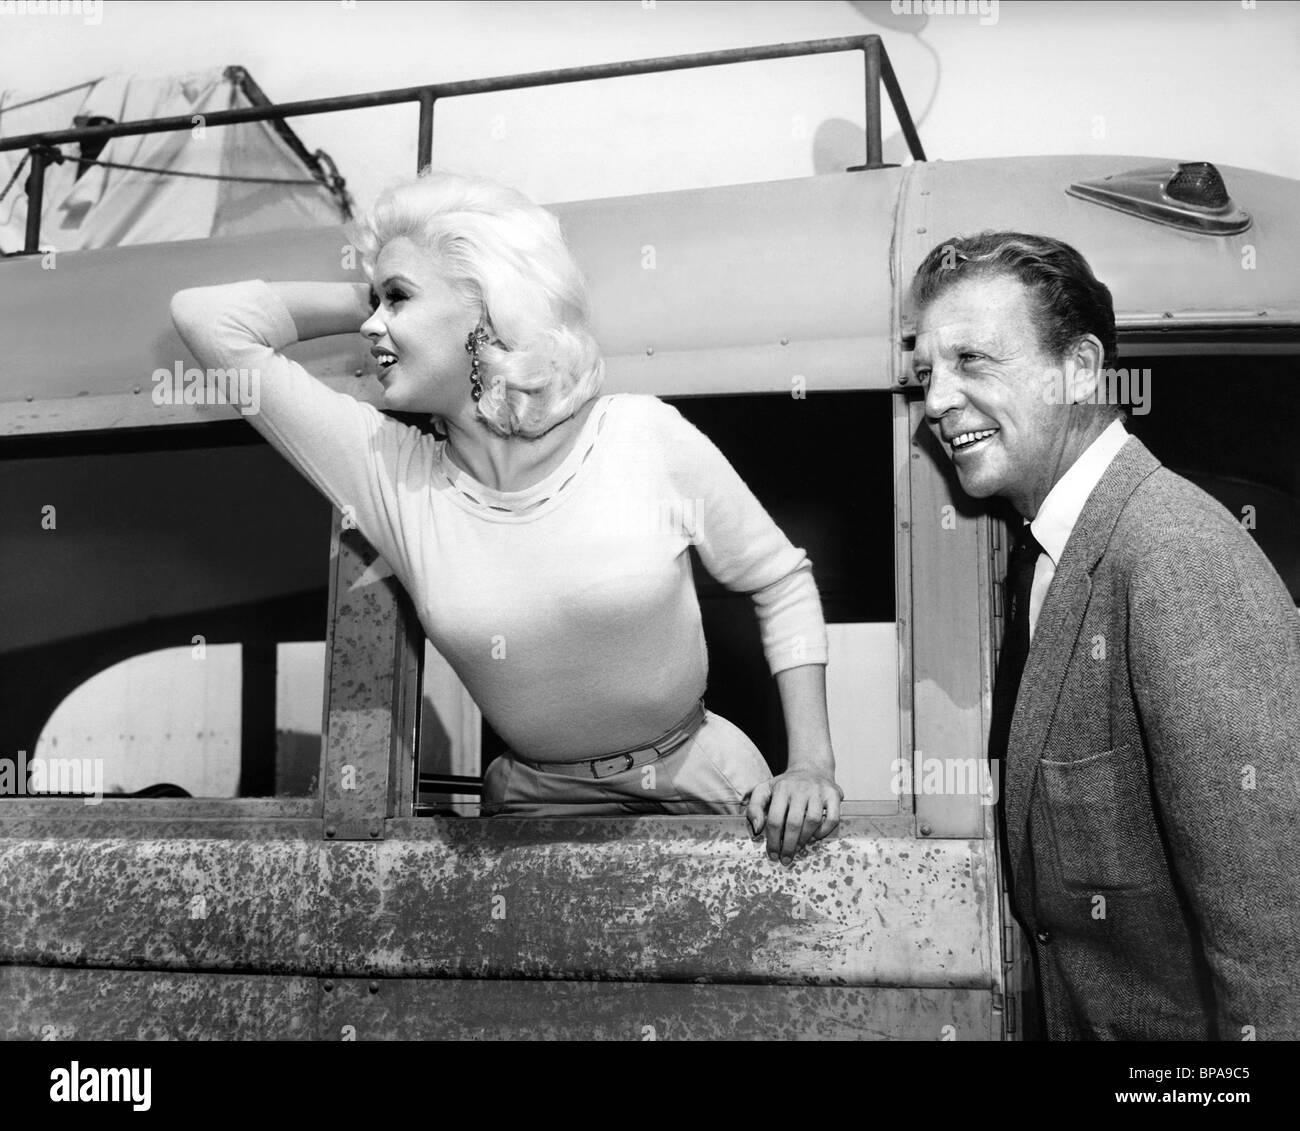 Jayne mansfield dan dailey the wayward bus 1957 stock image